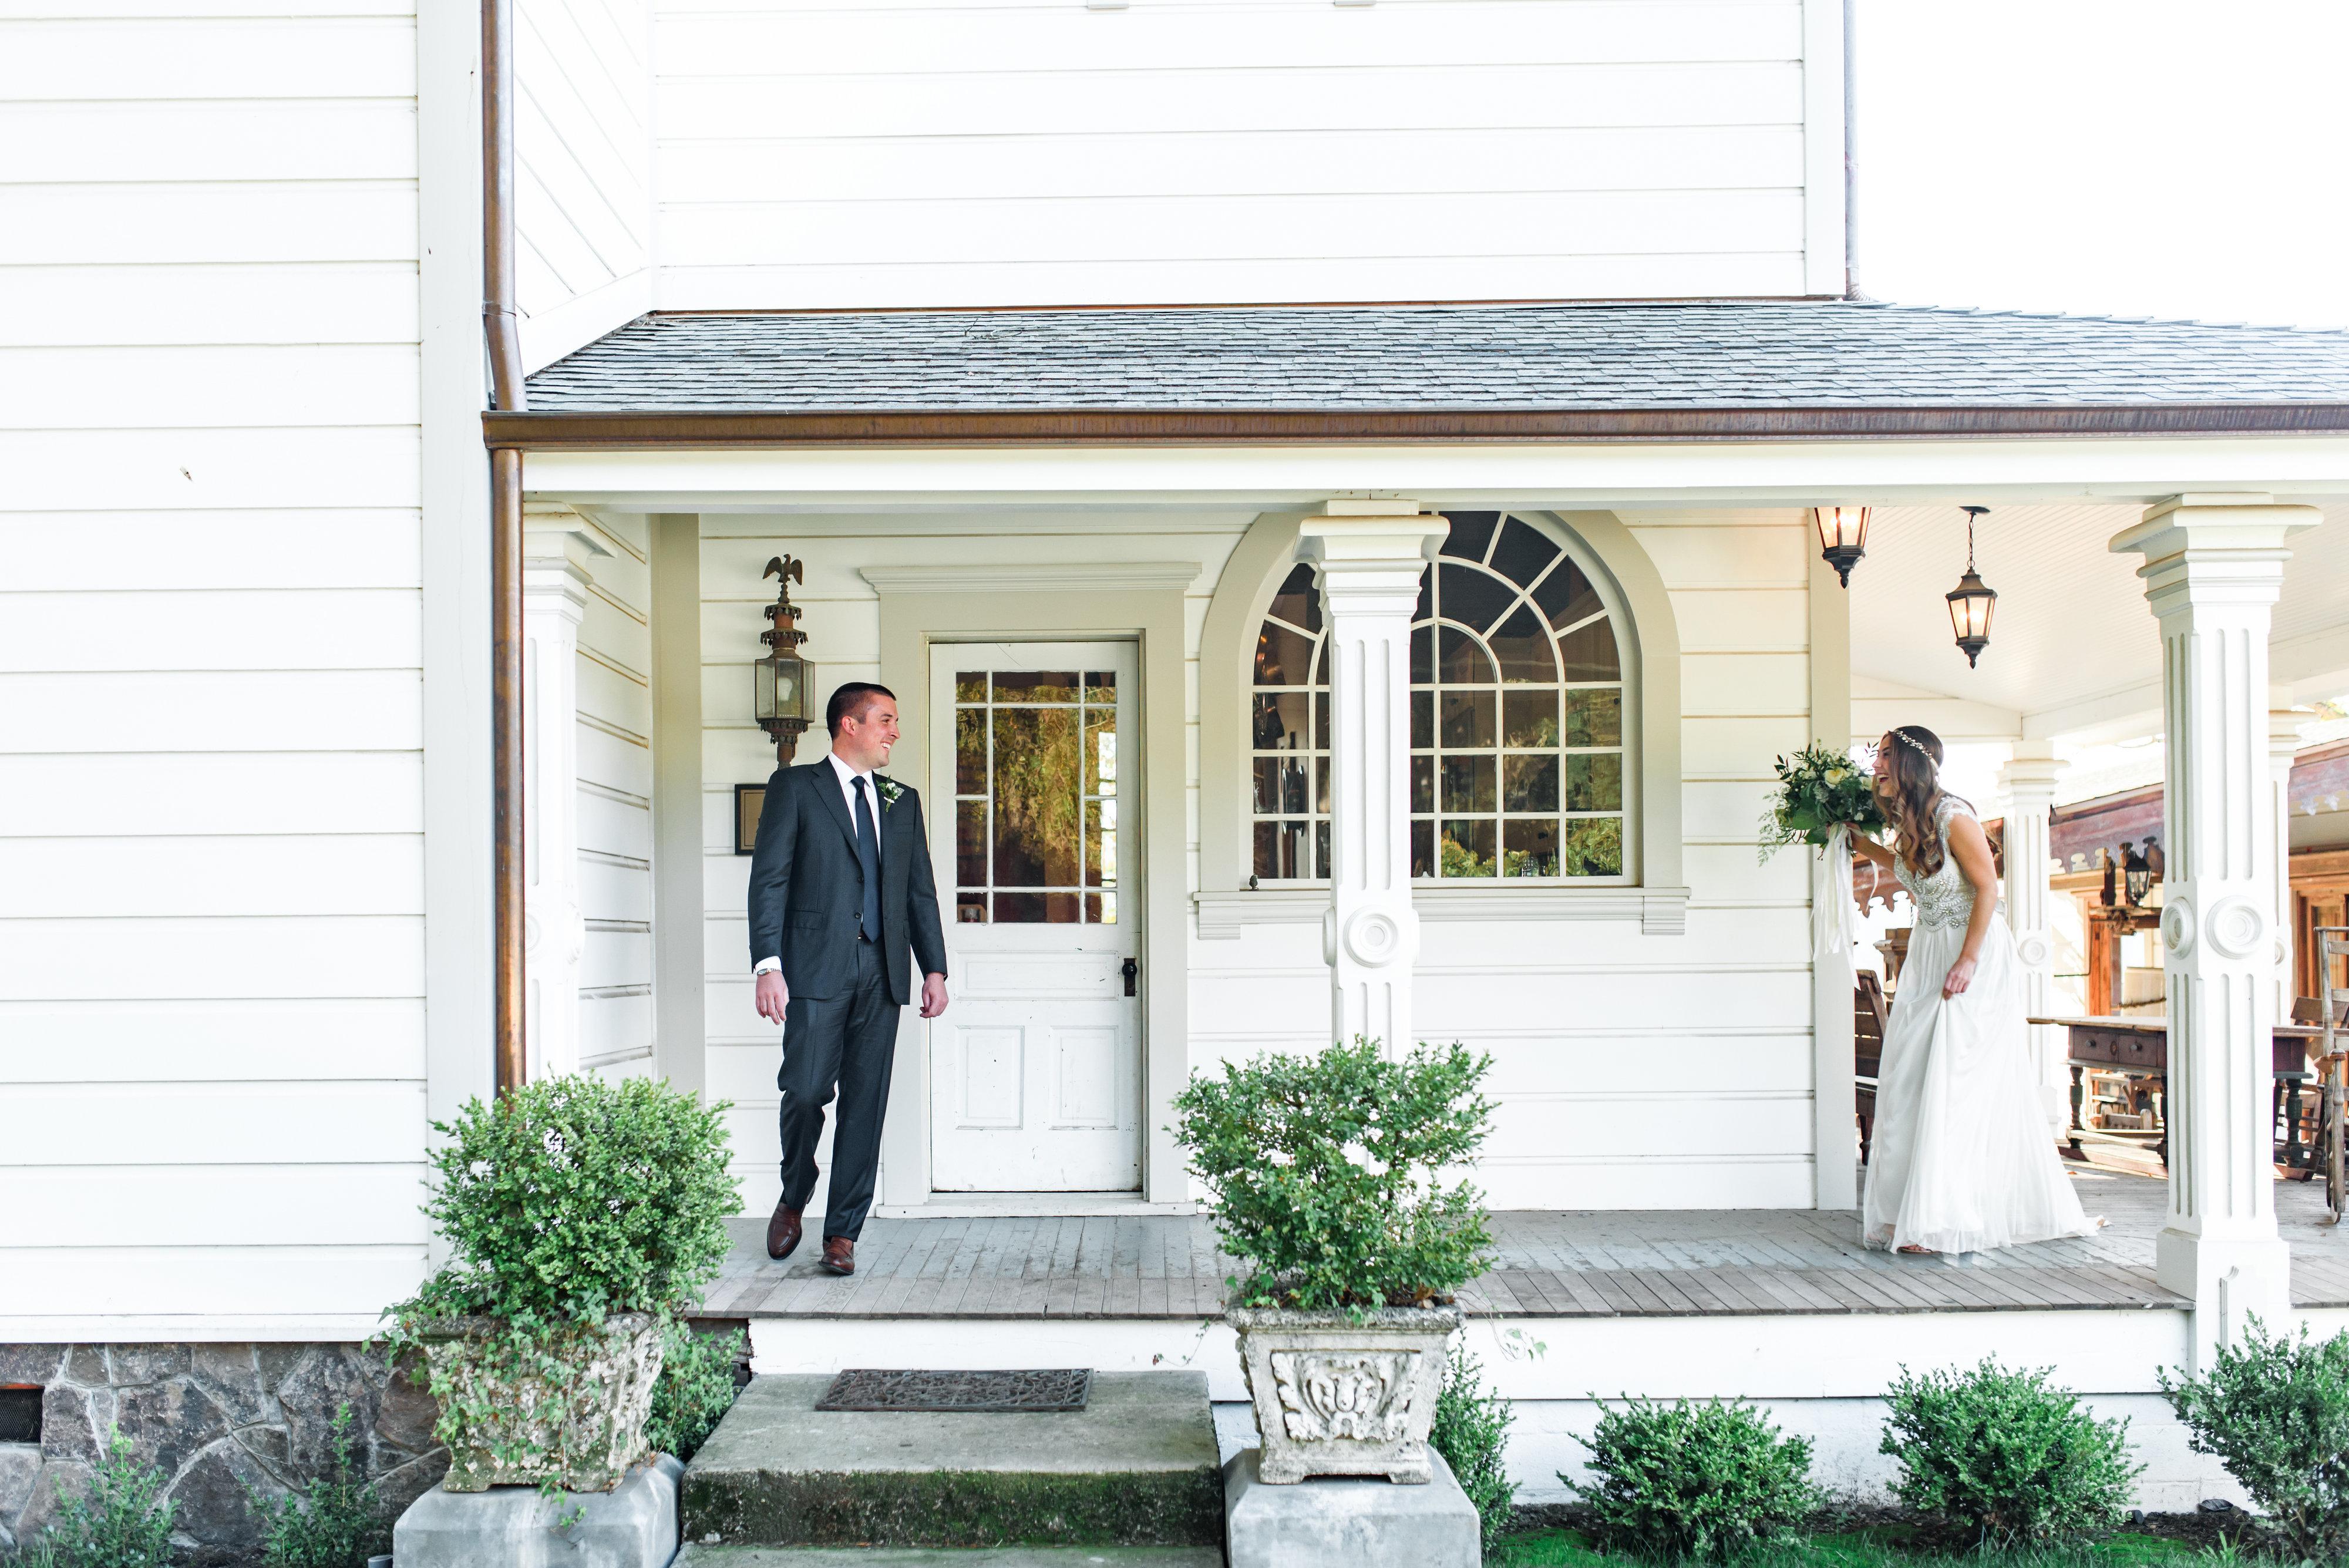 Calistoga Ranch Wedding - Weddings by Scott & Dana